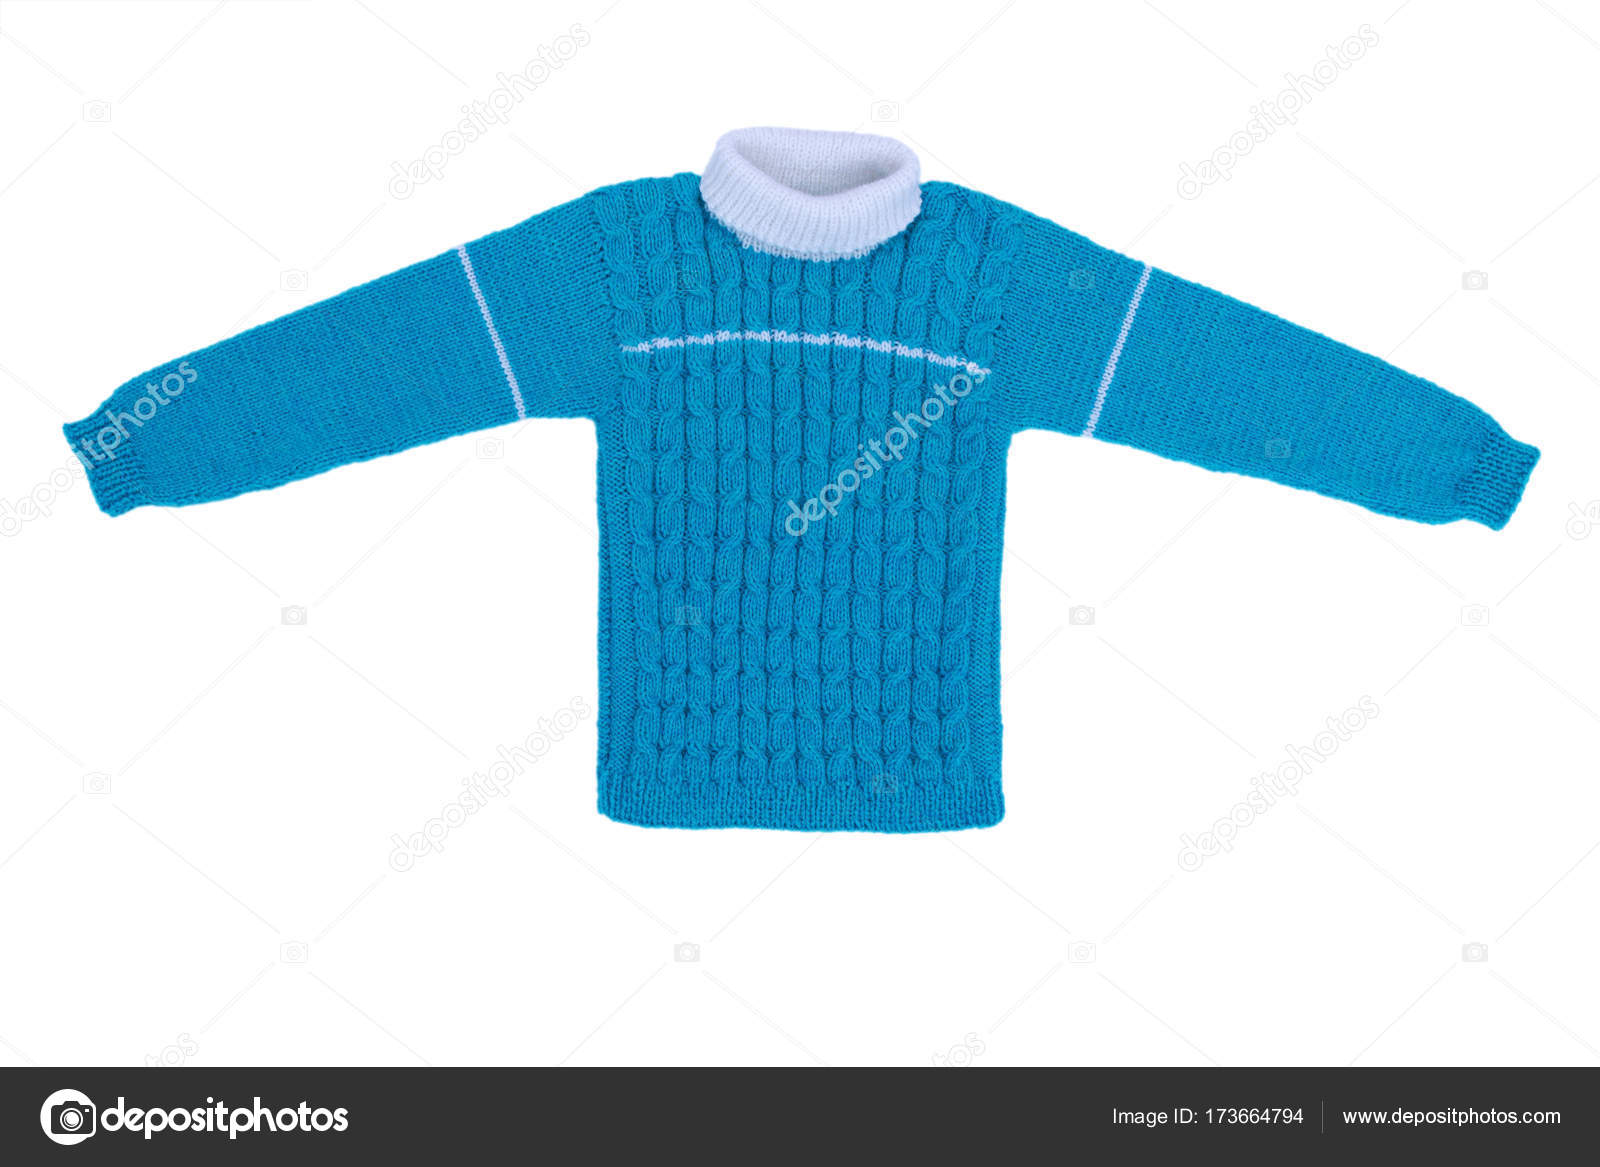 Suéter tejidos niños aislar sobre fondo blanco — Fotos de Stock ...